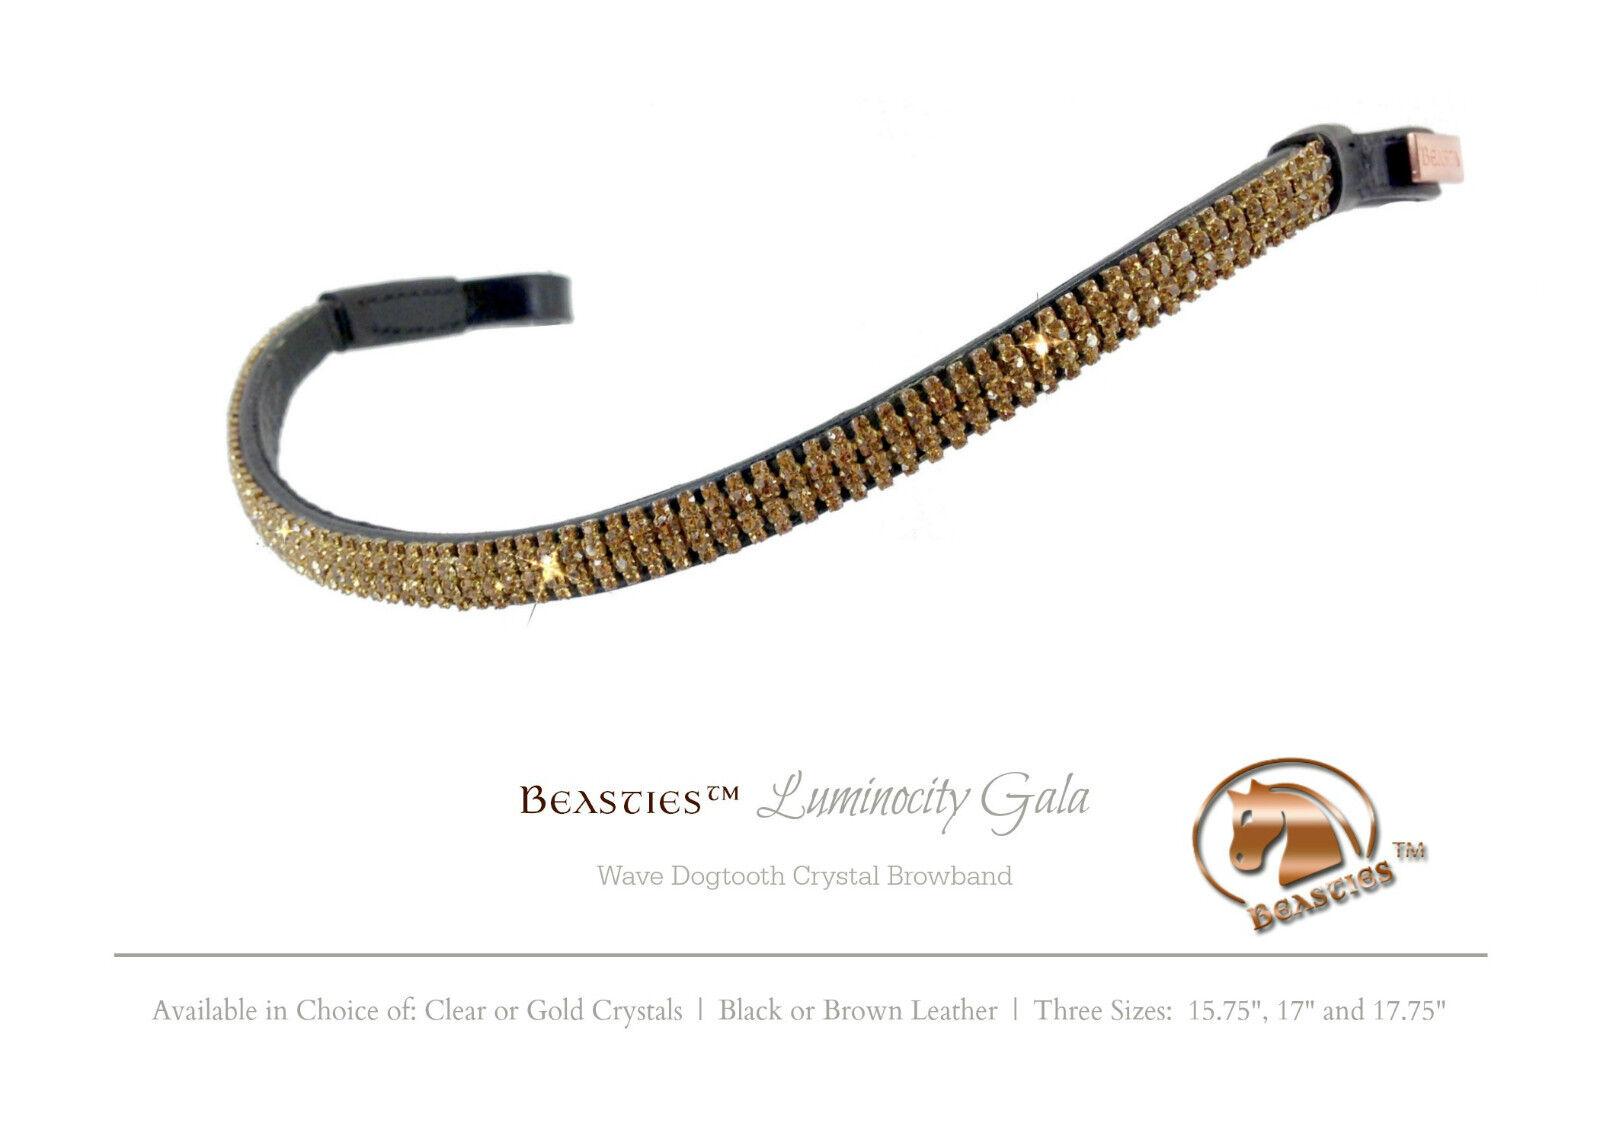 Gold/Blk Luminocity Wave Full/Wrmbld. Crystal Dressage Bridle Browband Größe: Full/Wrmbld. Wave 17